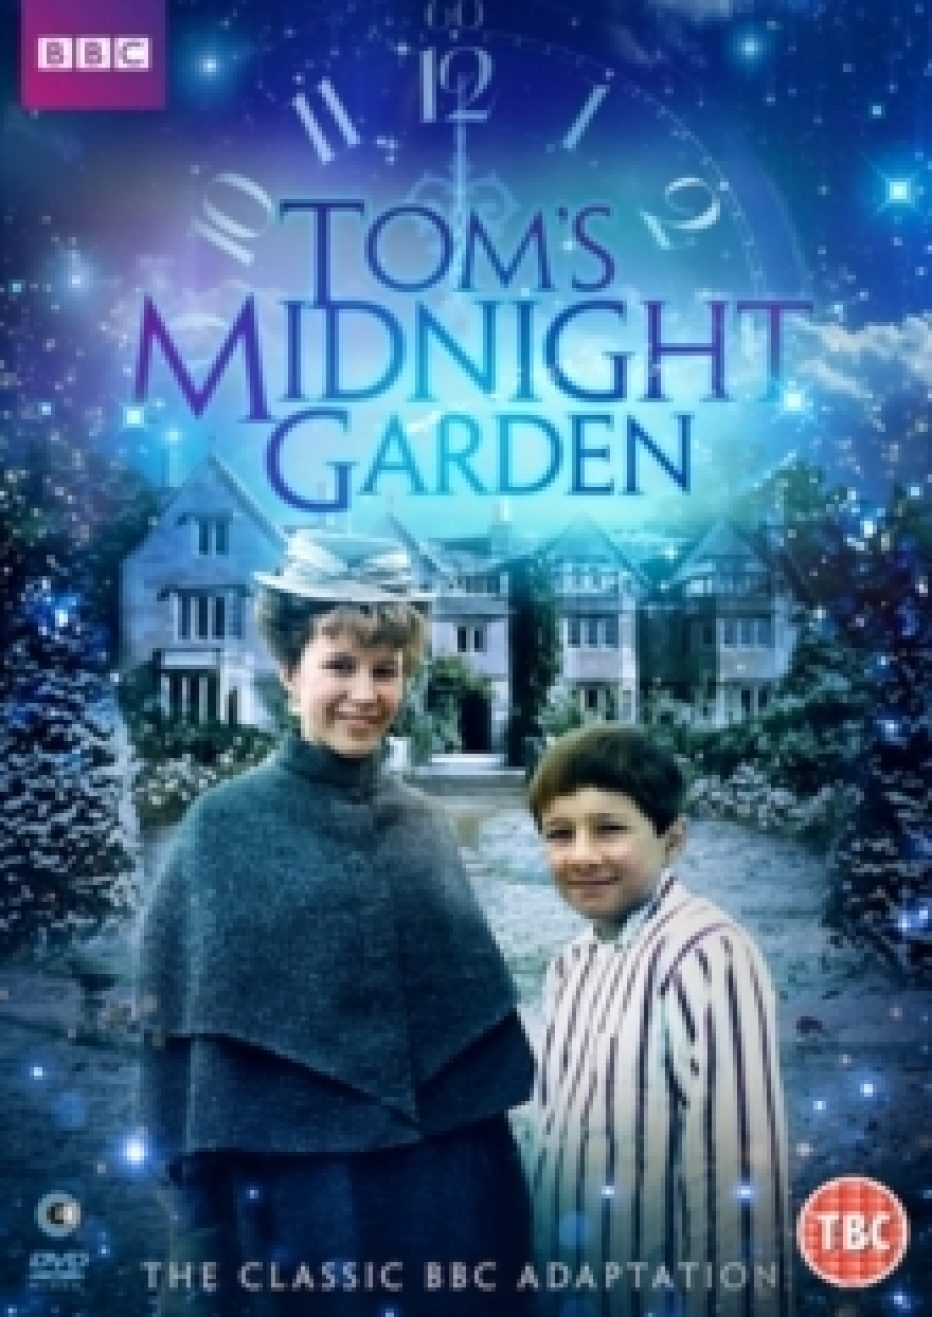 Tom\'s Midnight Garden arrives on DVD in time for Christmas 12 ...